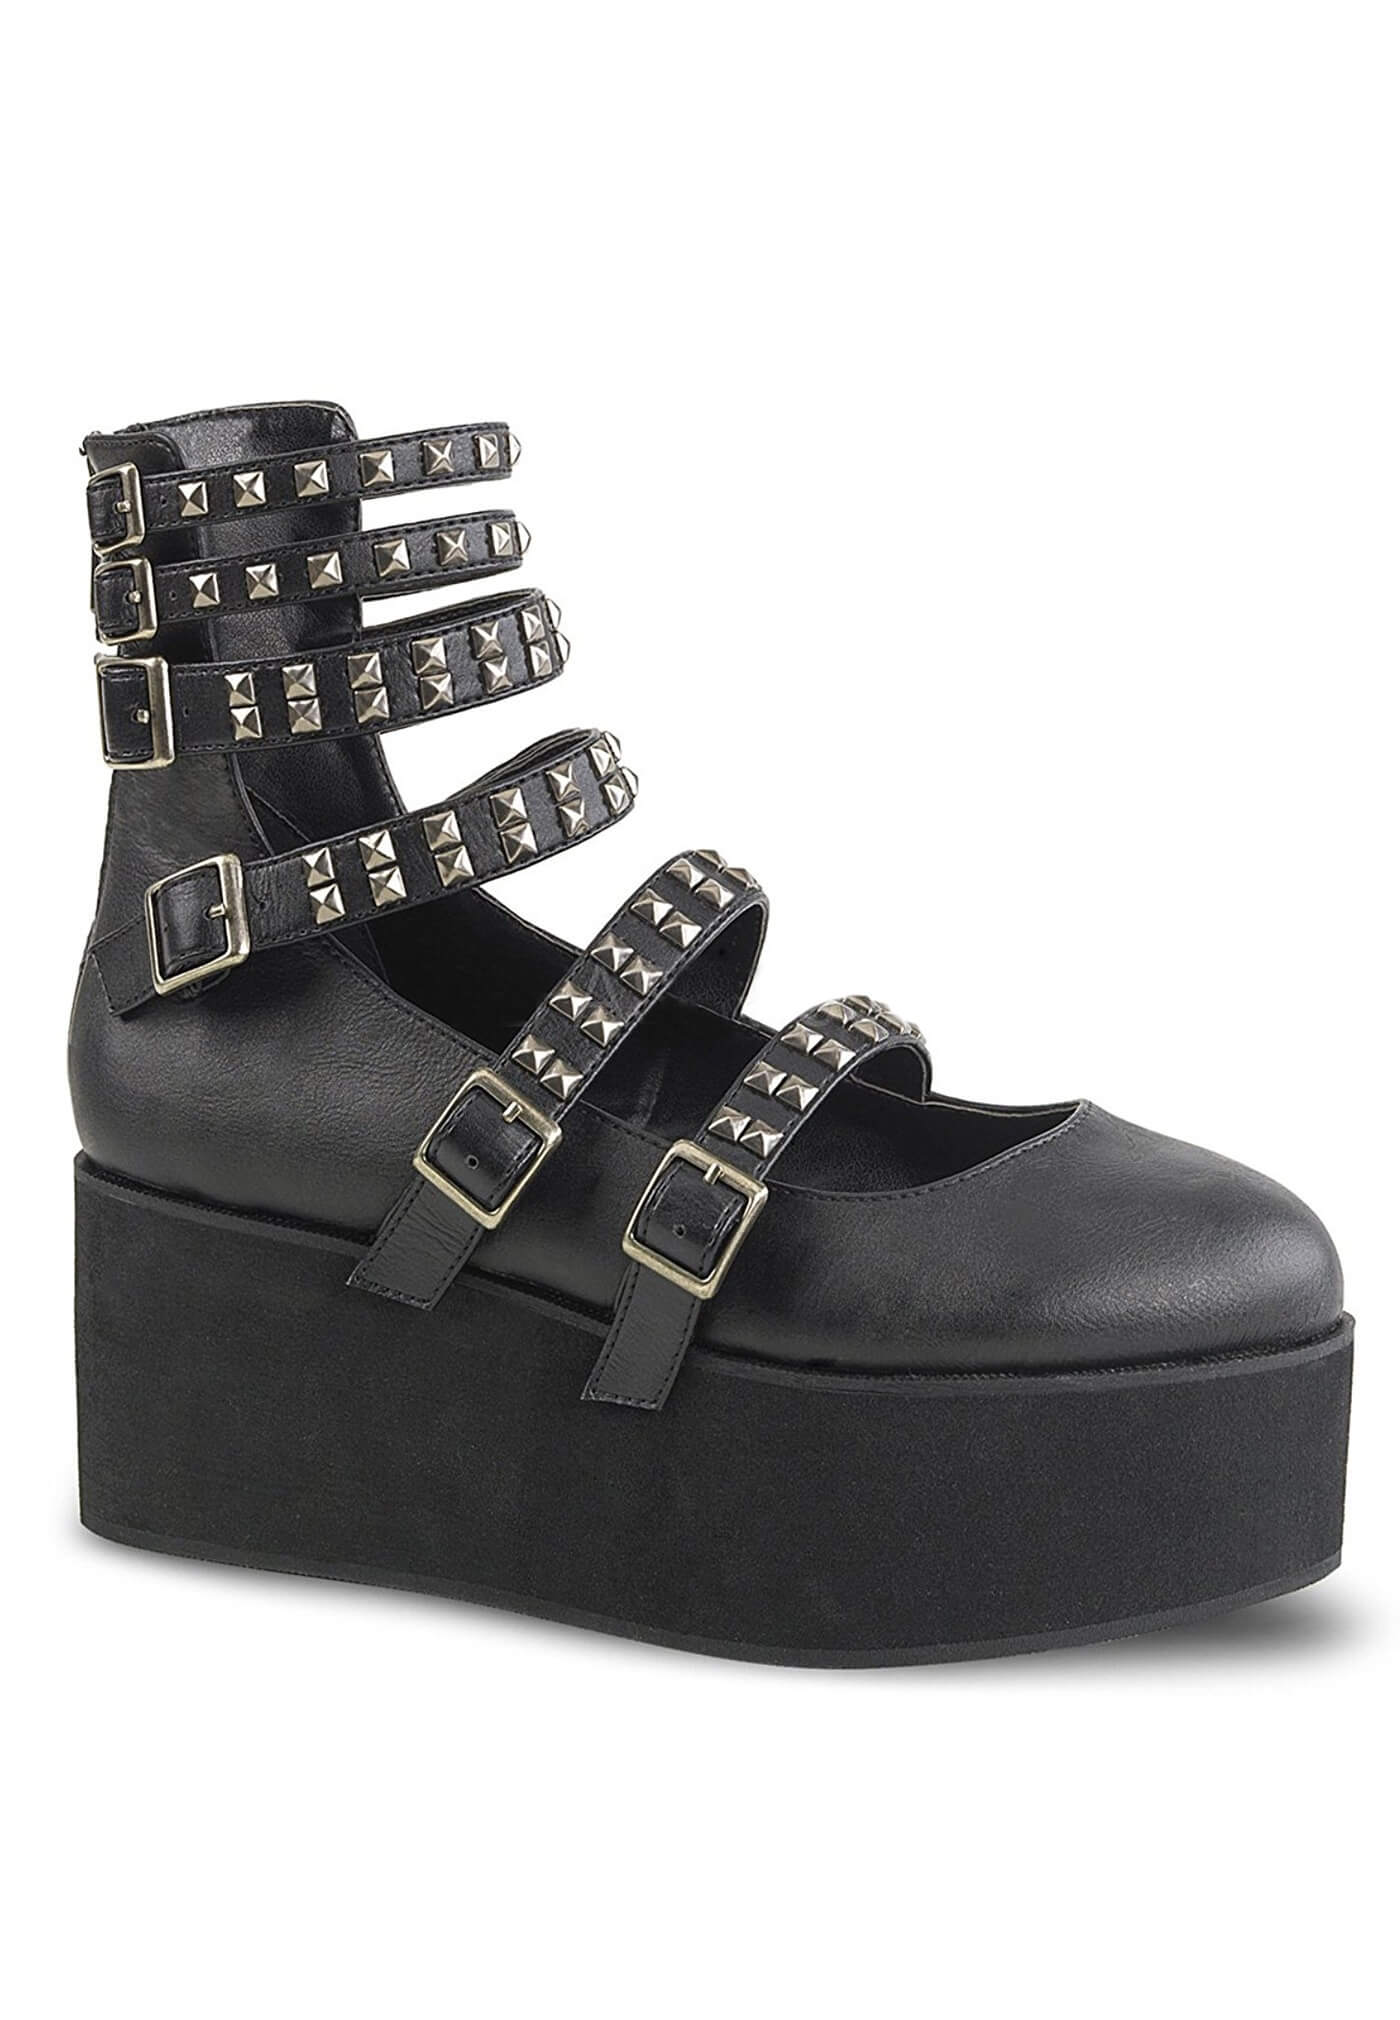 6fefbf609fc2 Demonia Black Platform Strappy Mary Jane Shoes